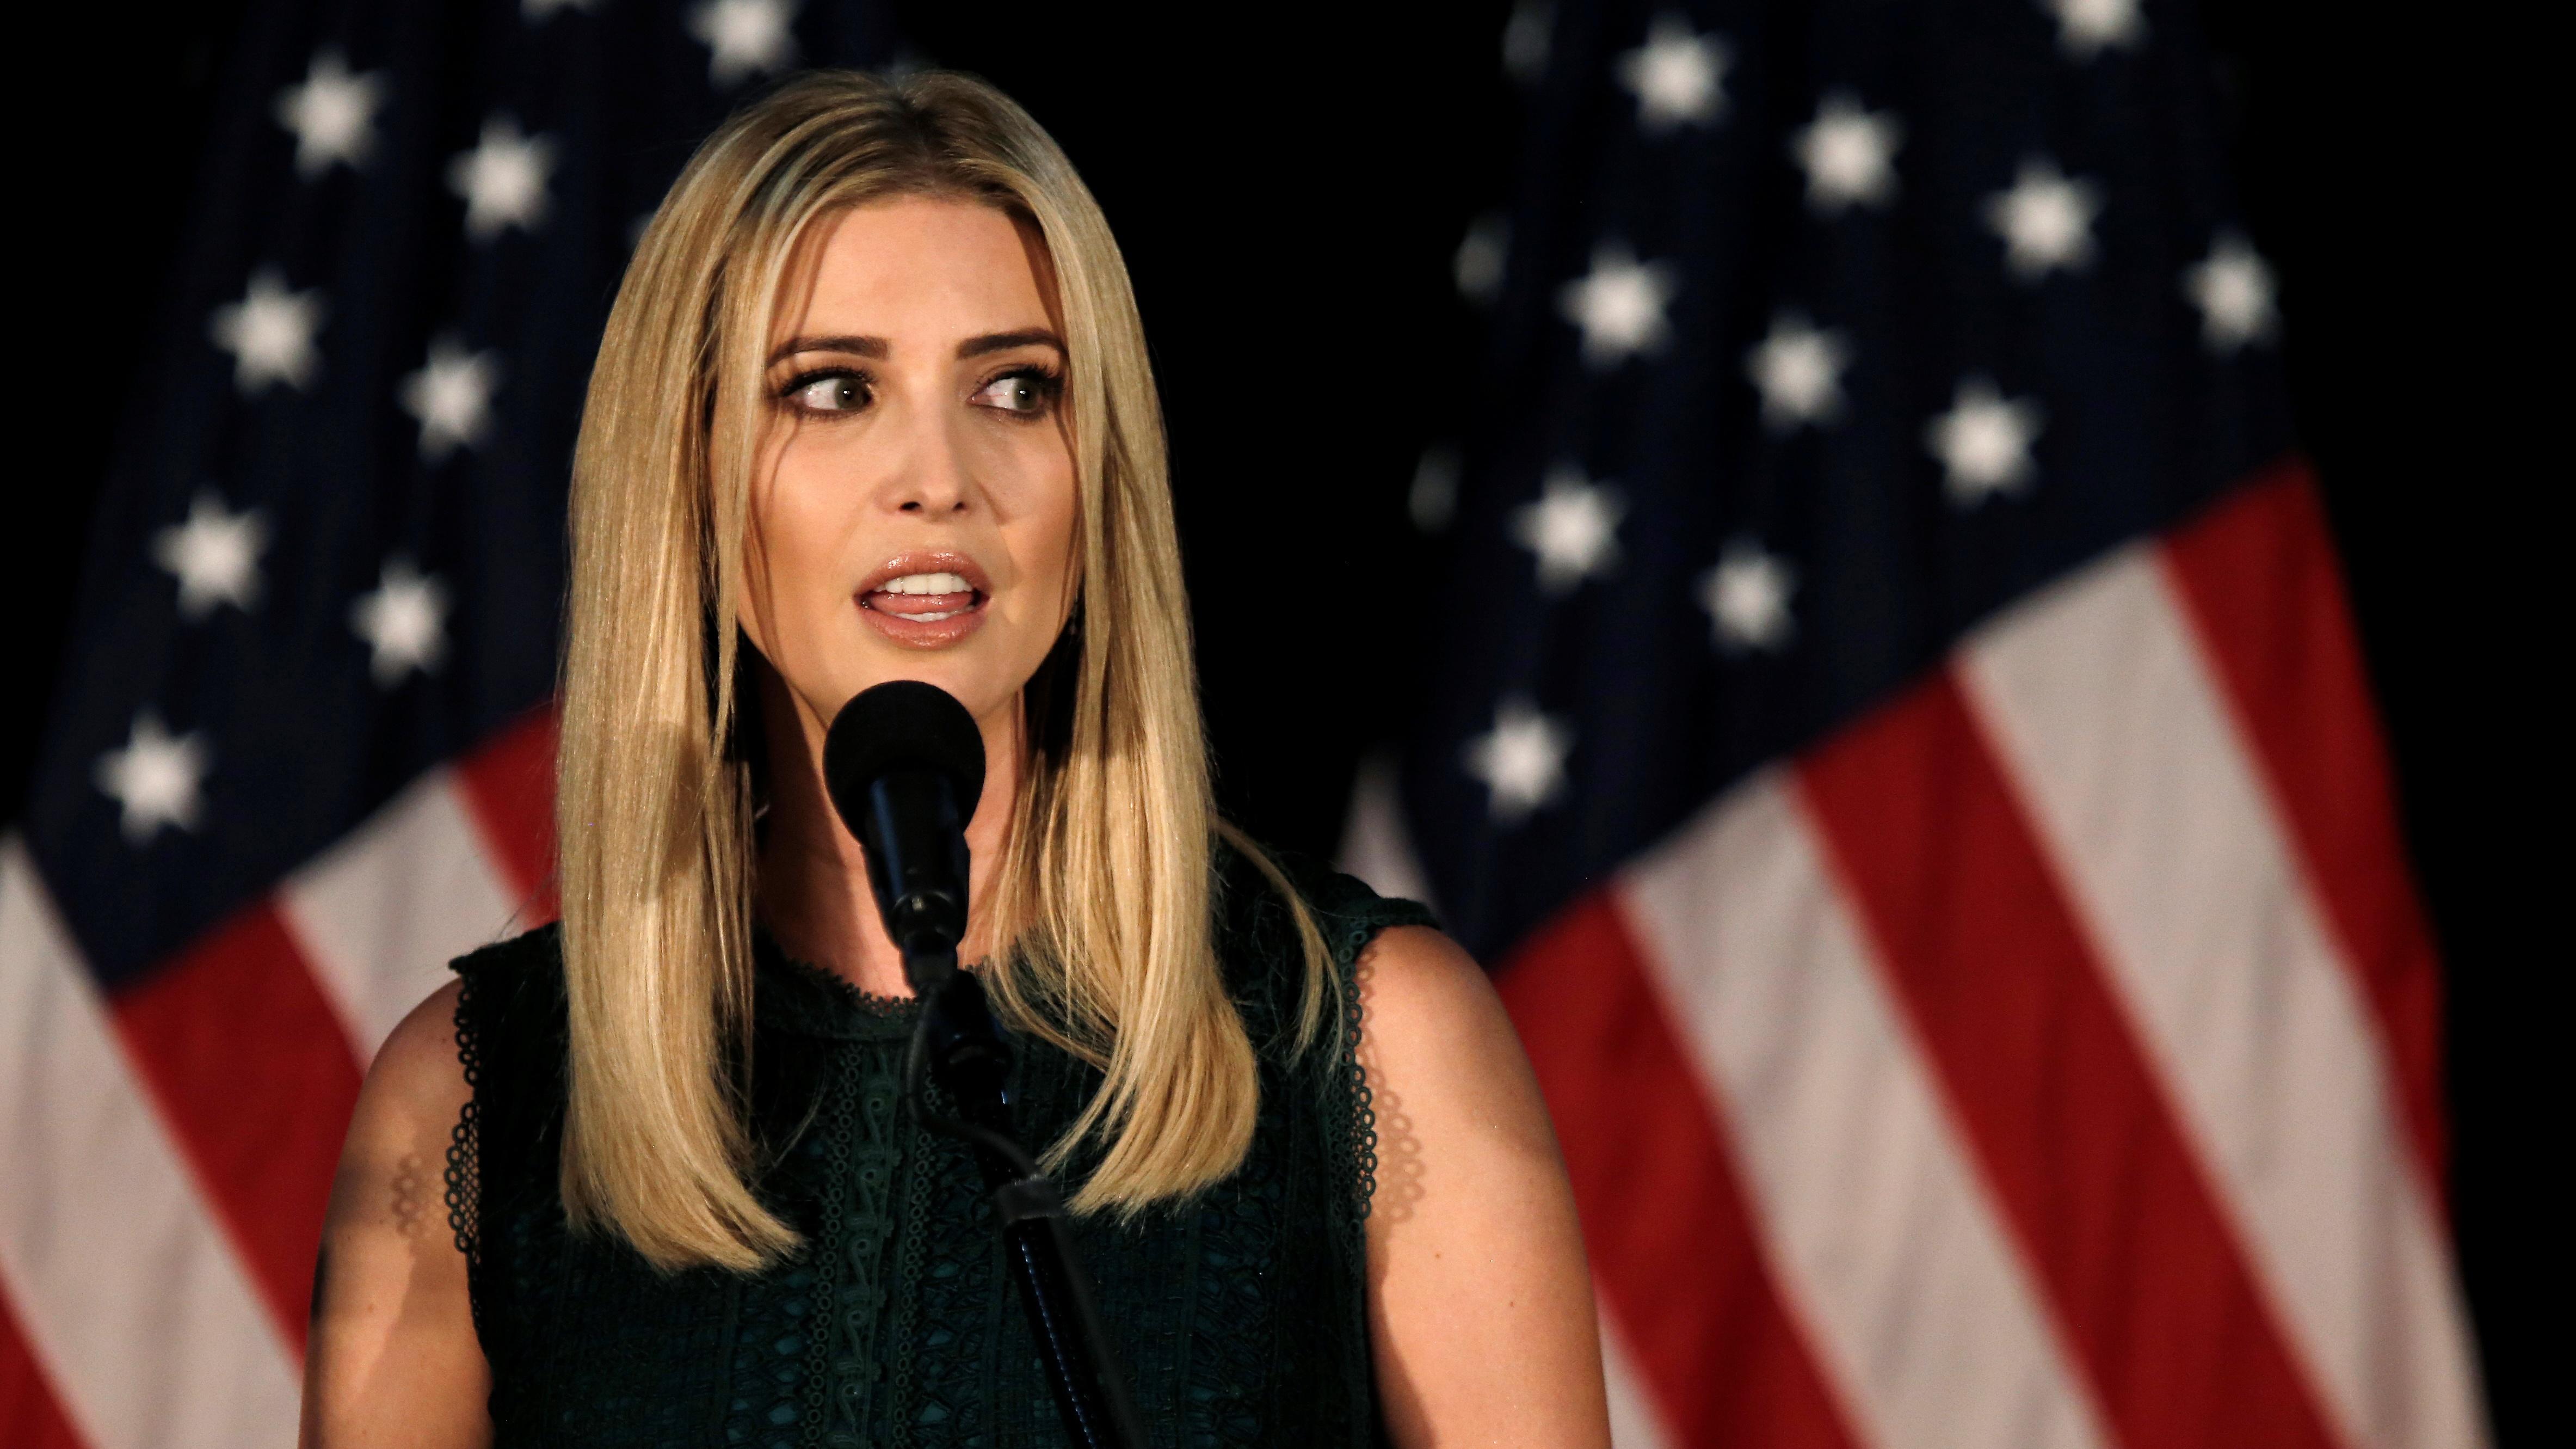 Ivanka Trump, daughter of Republican presidential nominee Donald Trump, speaks at a campaign event in Aston, Pennsylvania, U.S., September 13, 2016. REUTERS/Mike Segar